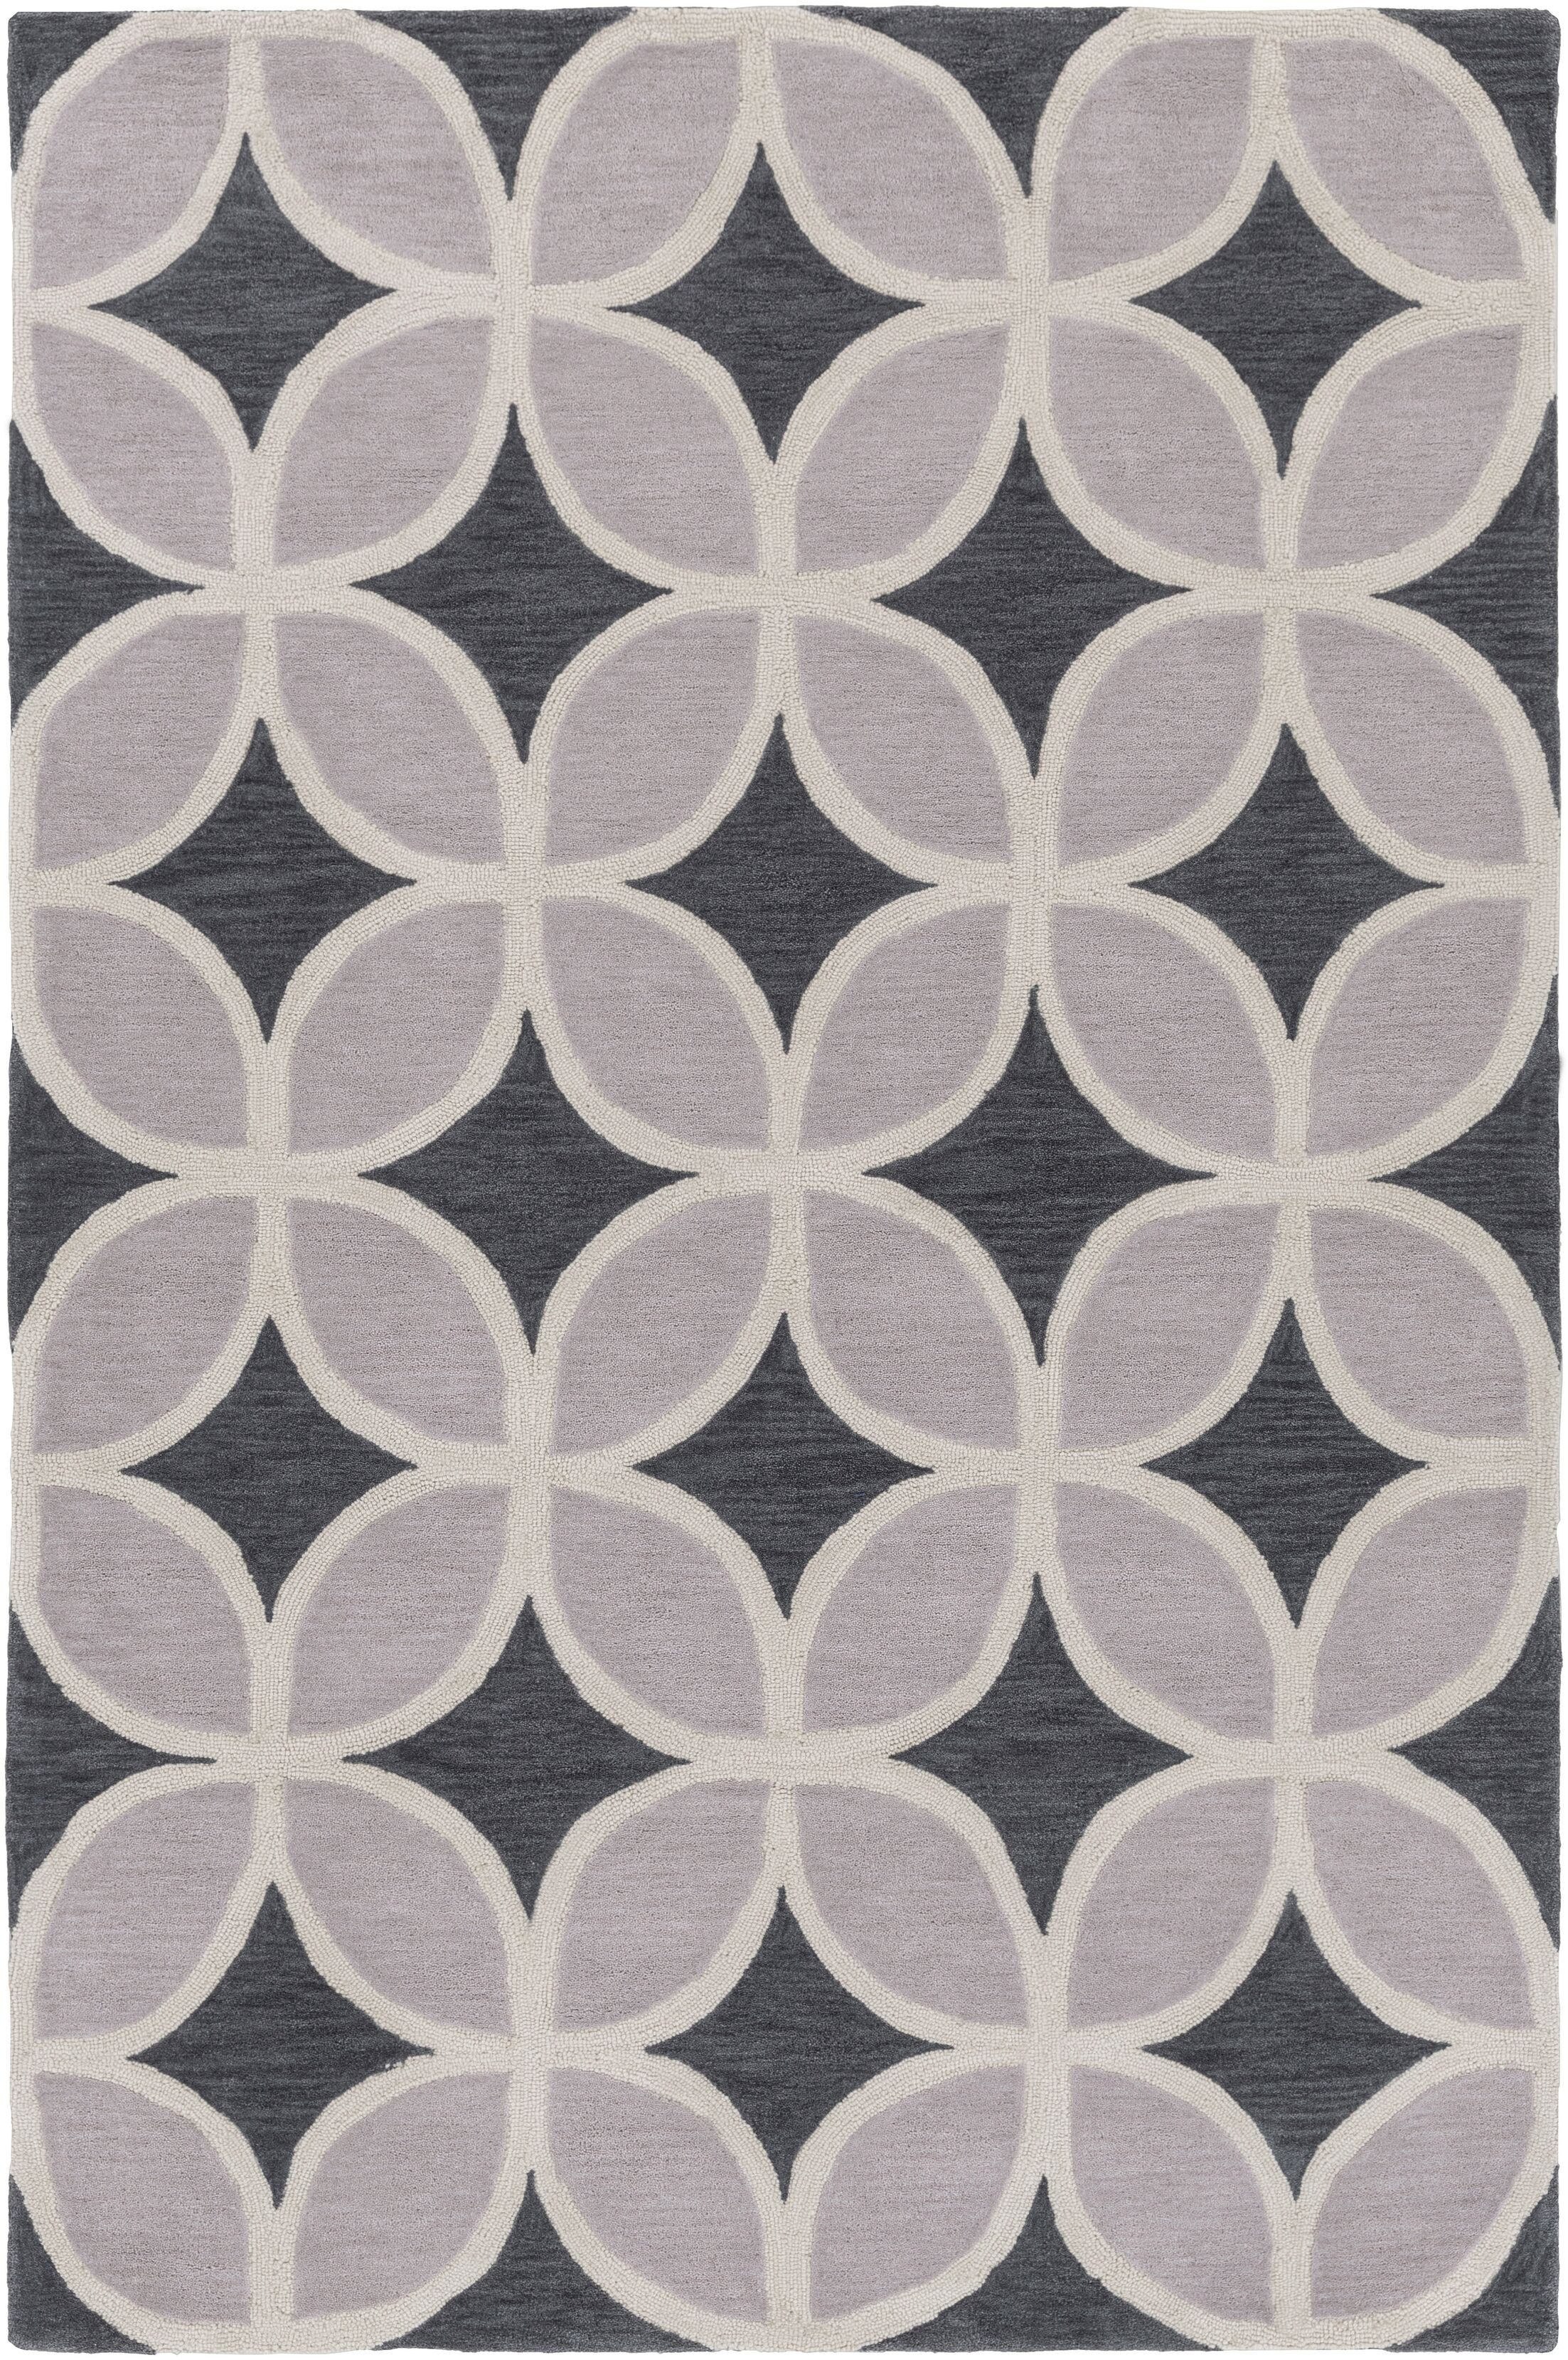 Kroeker Charcoal & Light Gray Area Rug Rug Size: Rectangle 5' x 7'6